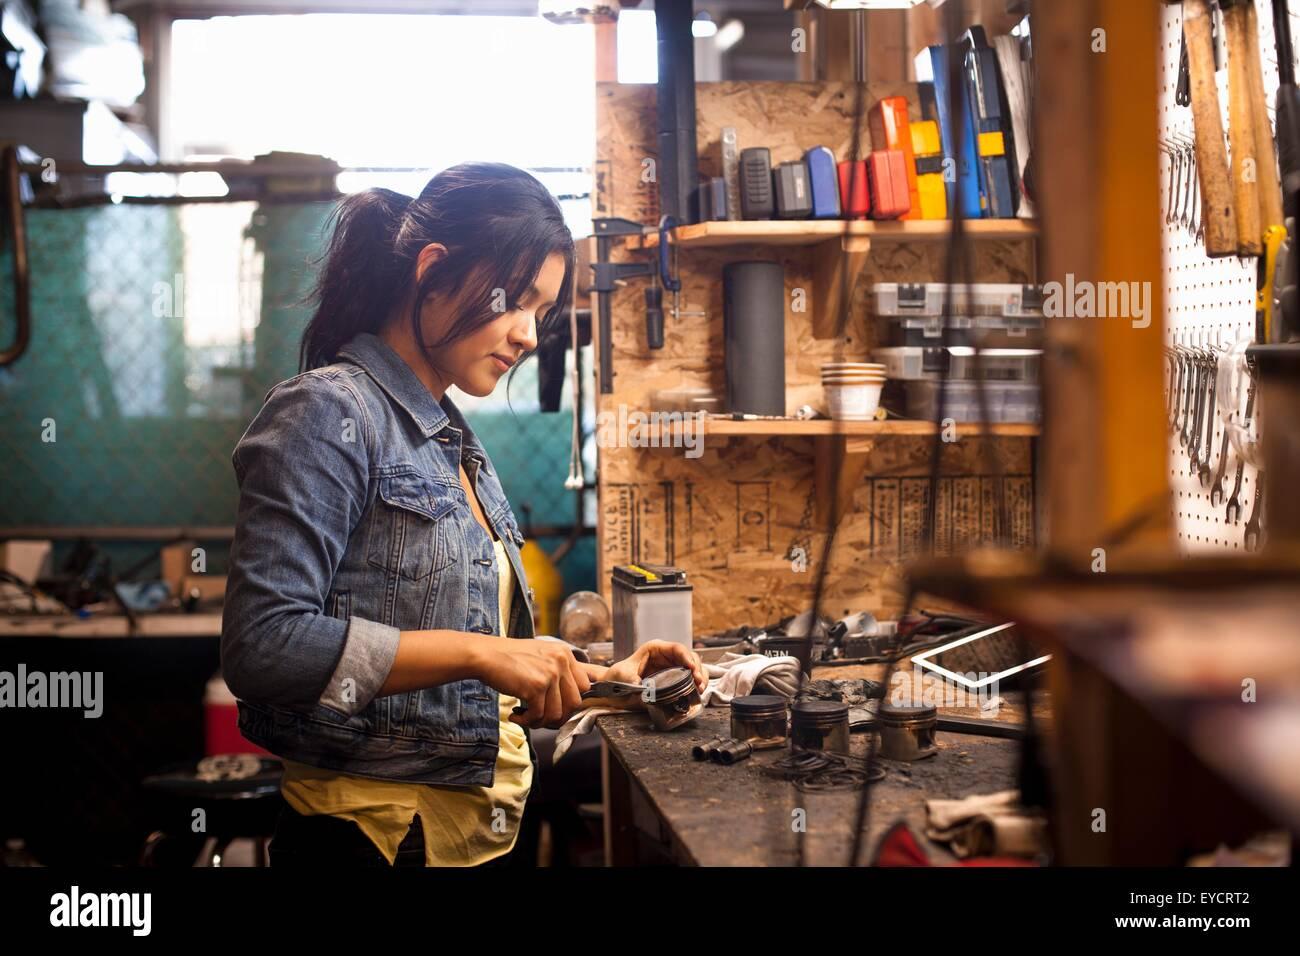 Female mechanic in workshop - Stock Image